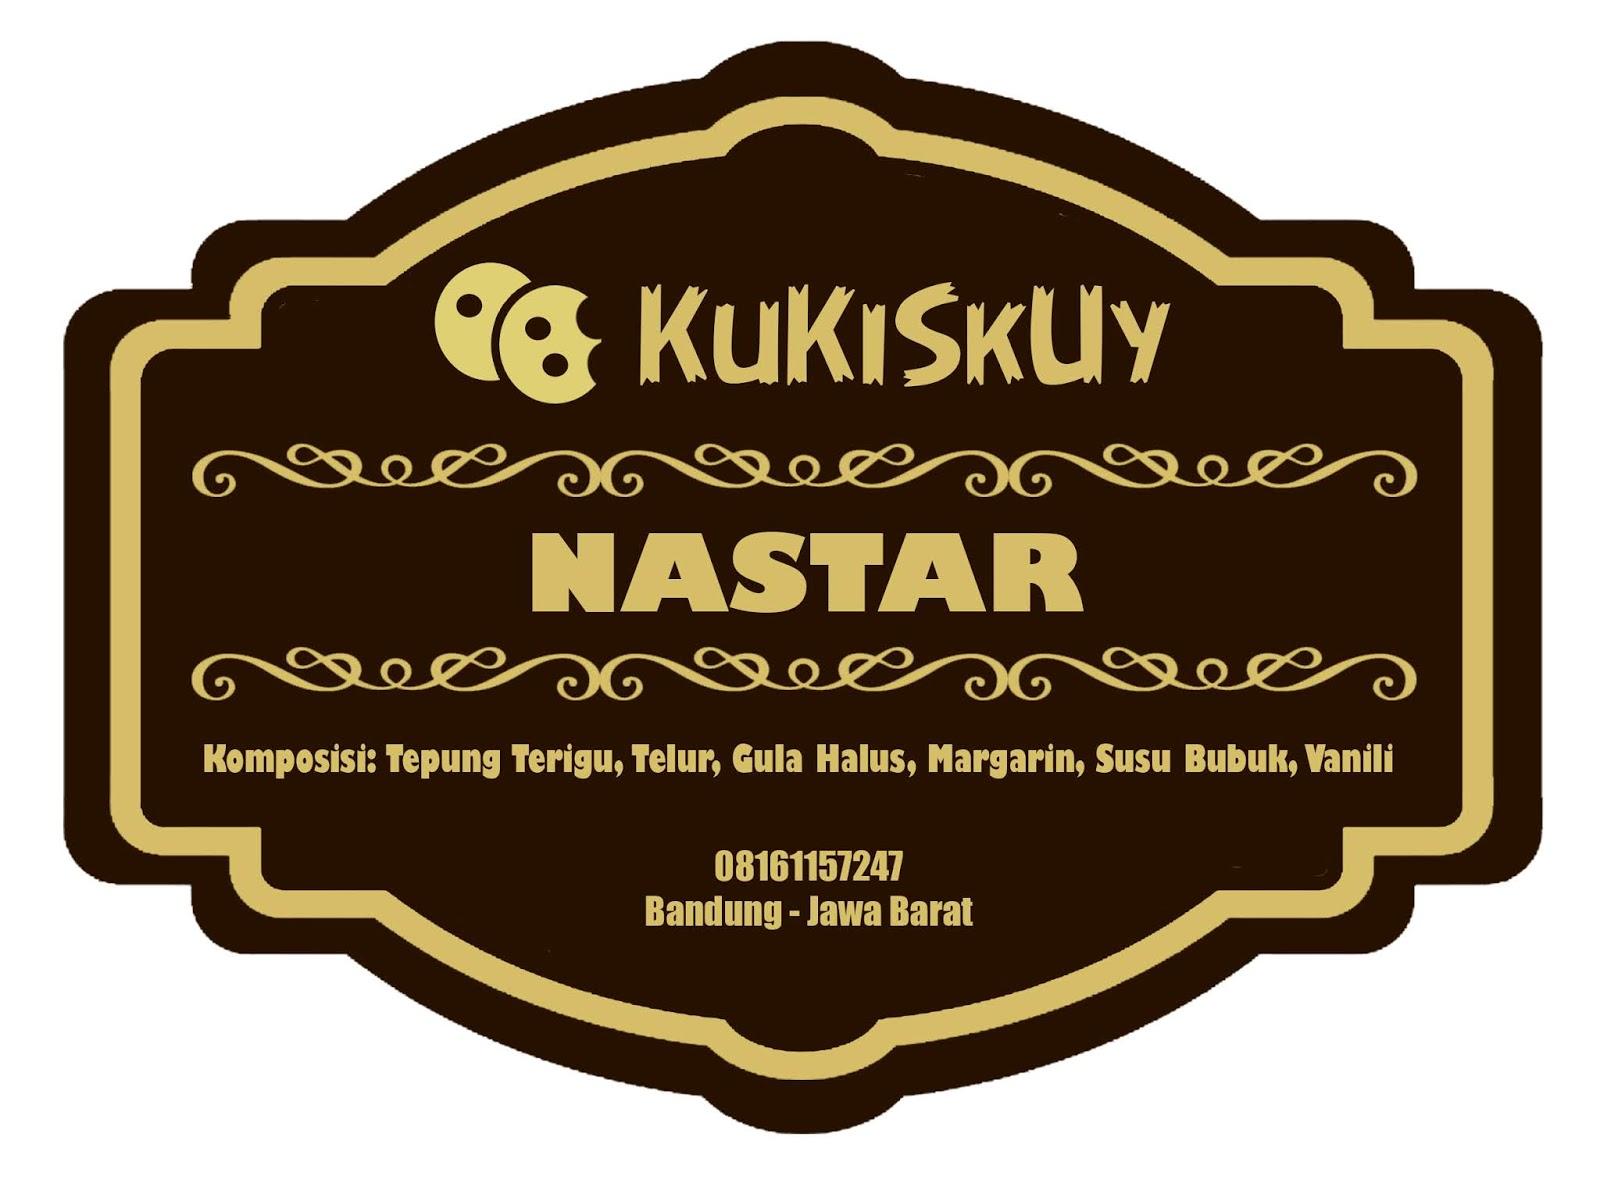 Logo Perusahaan Makanan Kukiskuy Aa Media Network It Design And Printing Solution